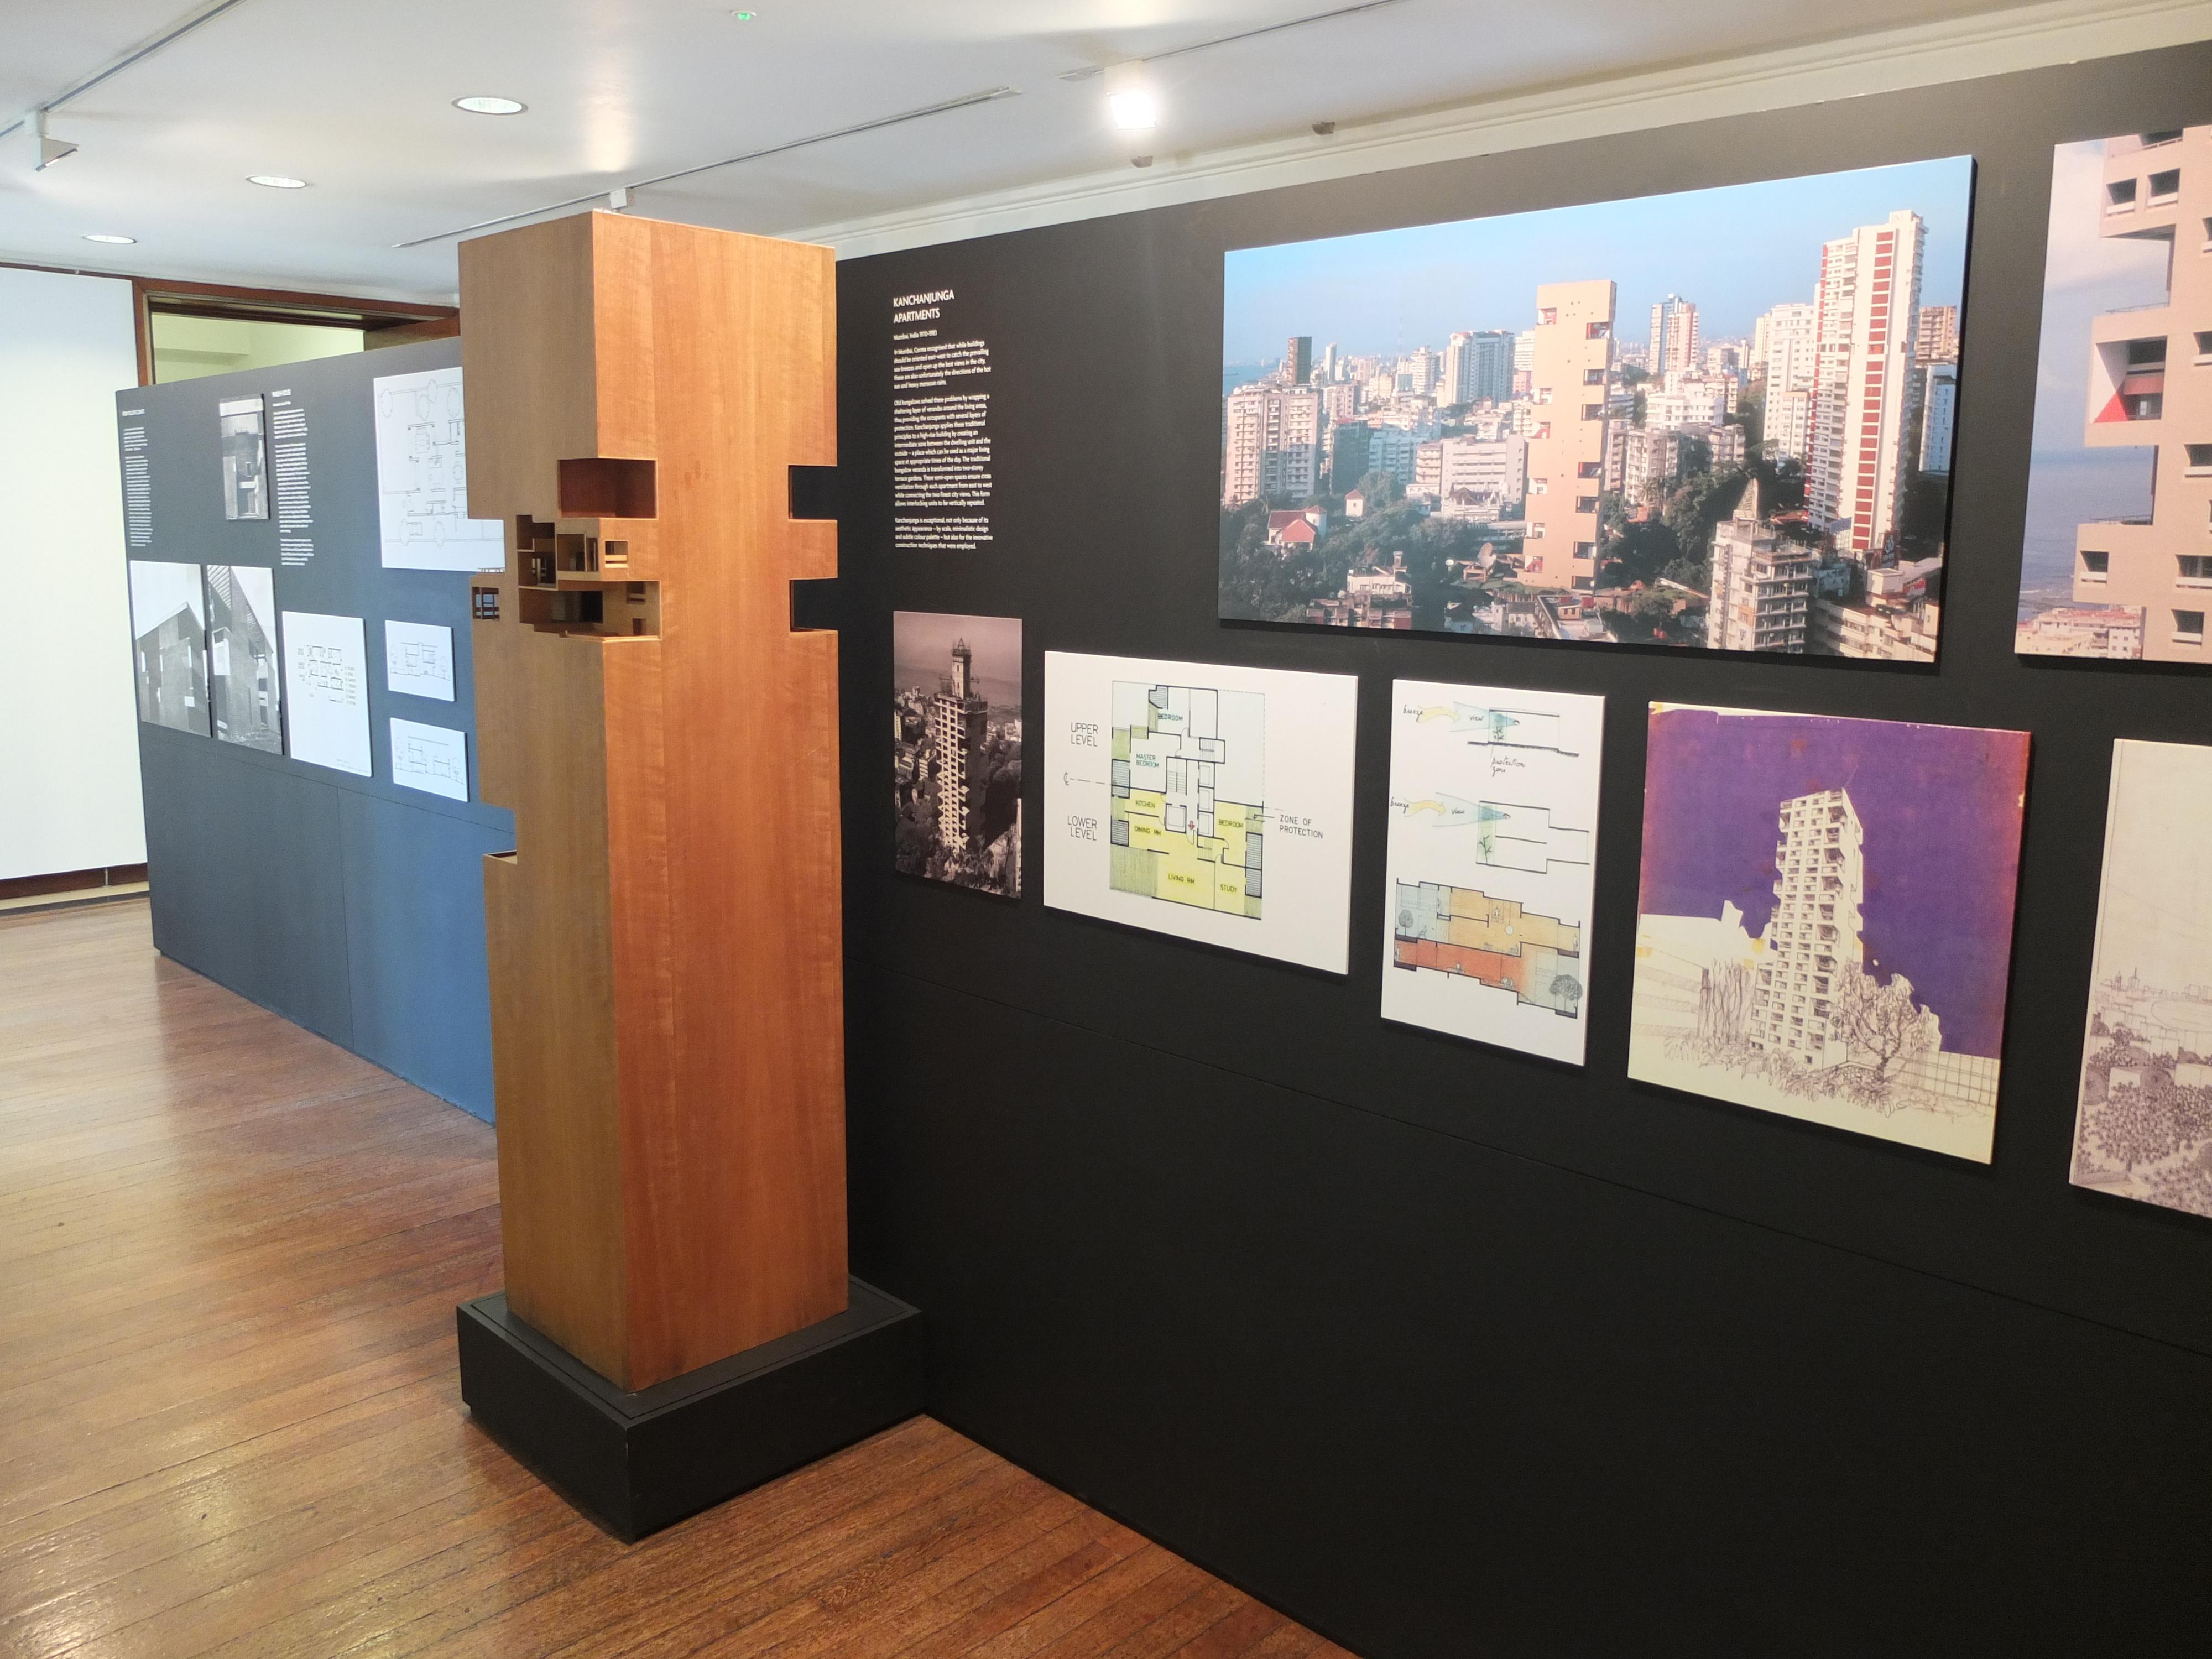 Exhibition Review: Charles Correa at the RIBA | Transnational ...